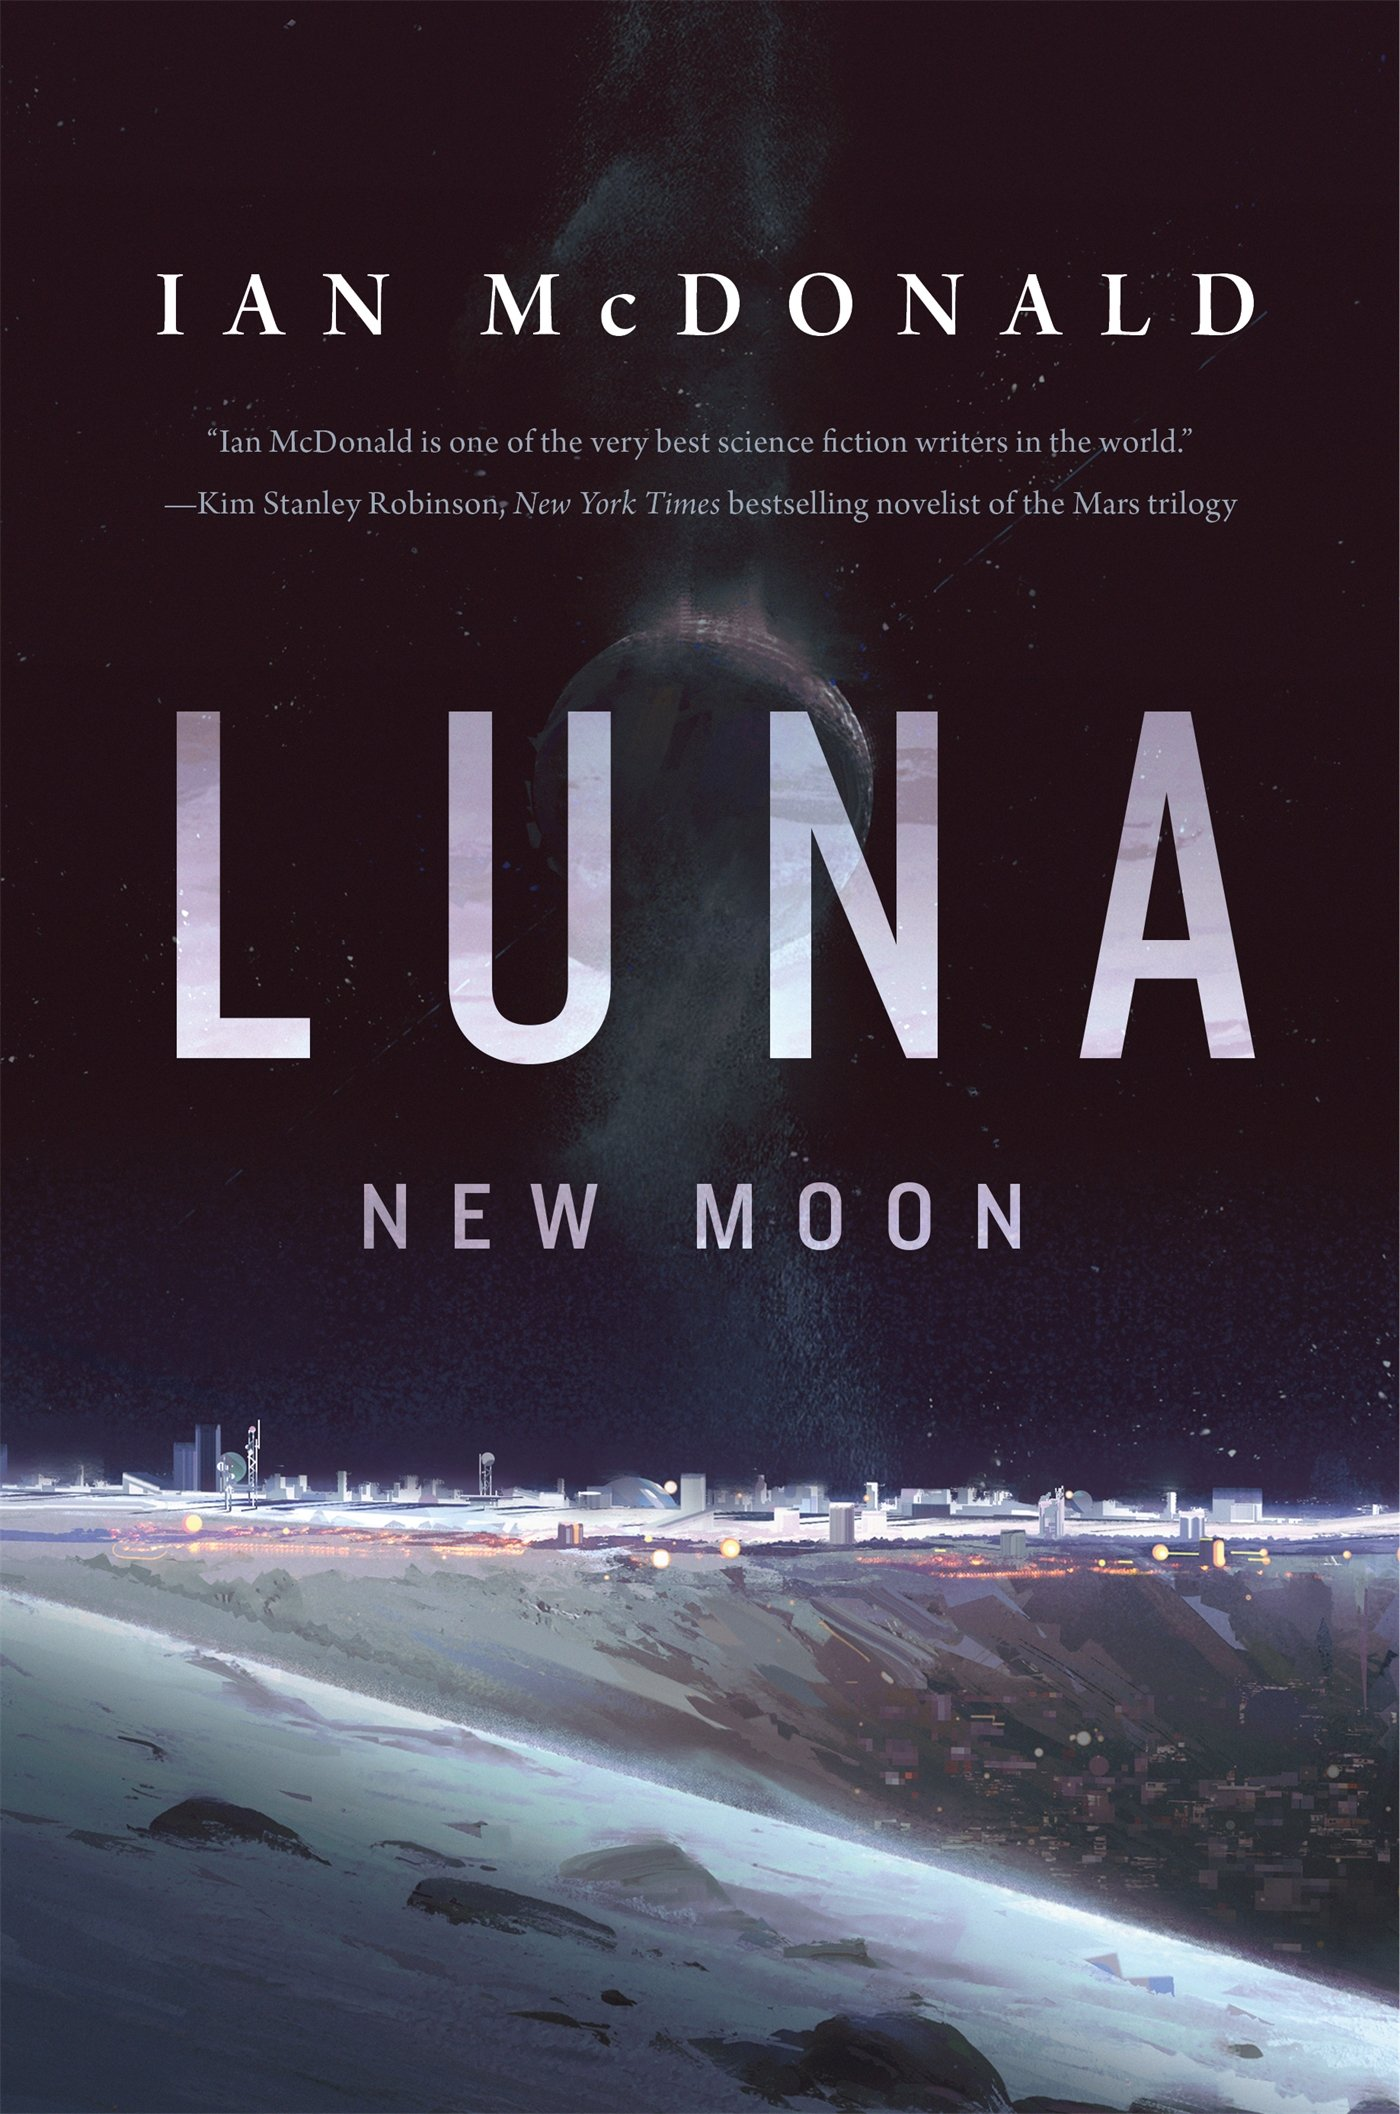 Amazon.com: Luna: New Moon (9780765375520): McDonald, Ian: Books